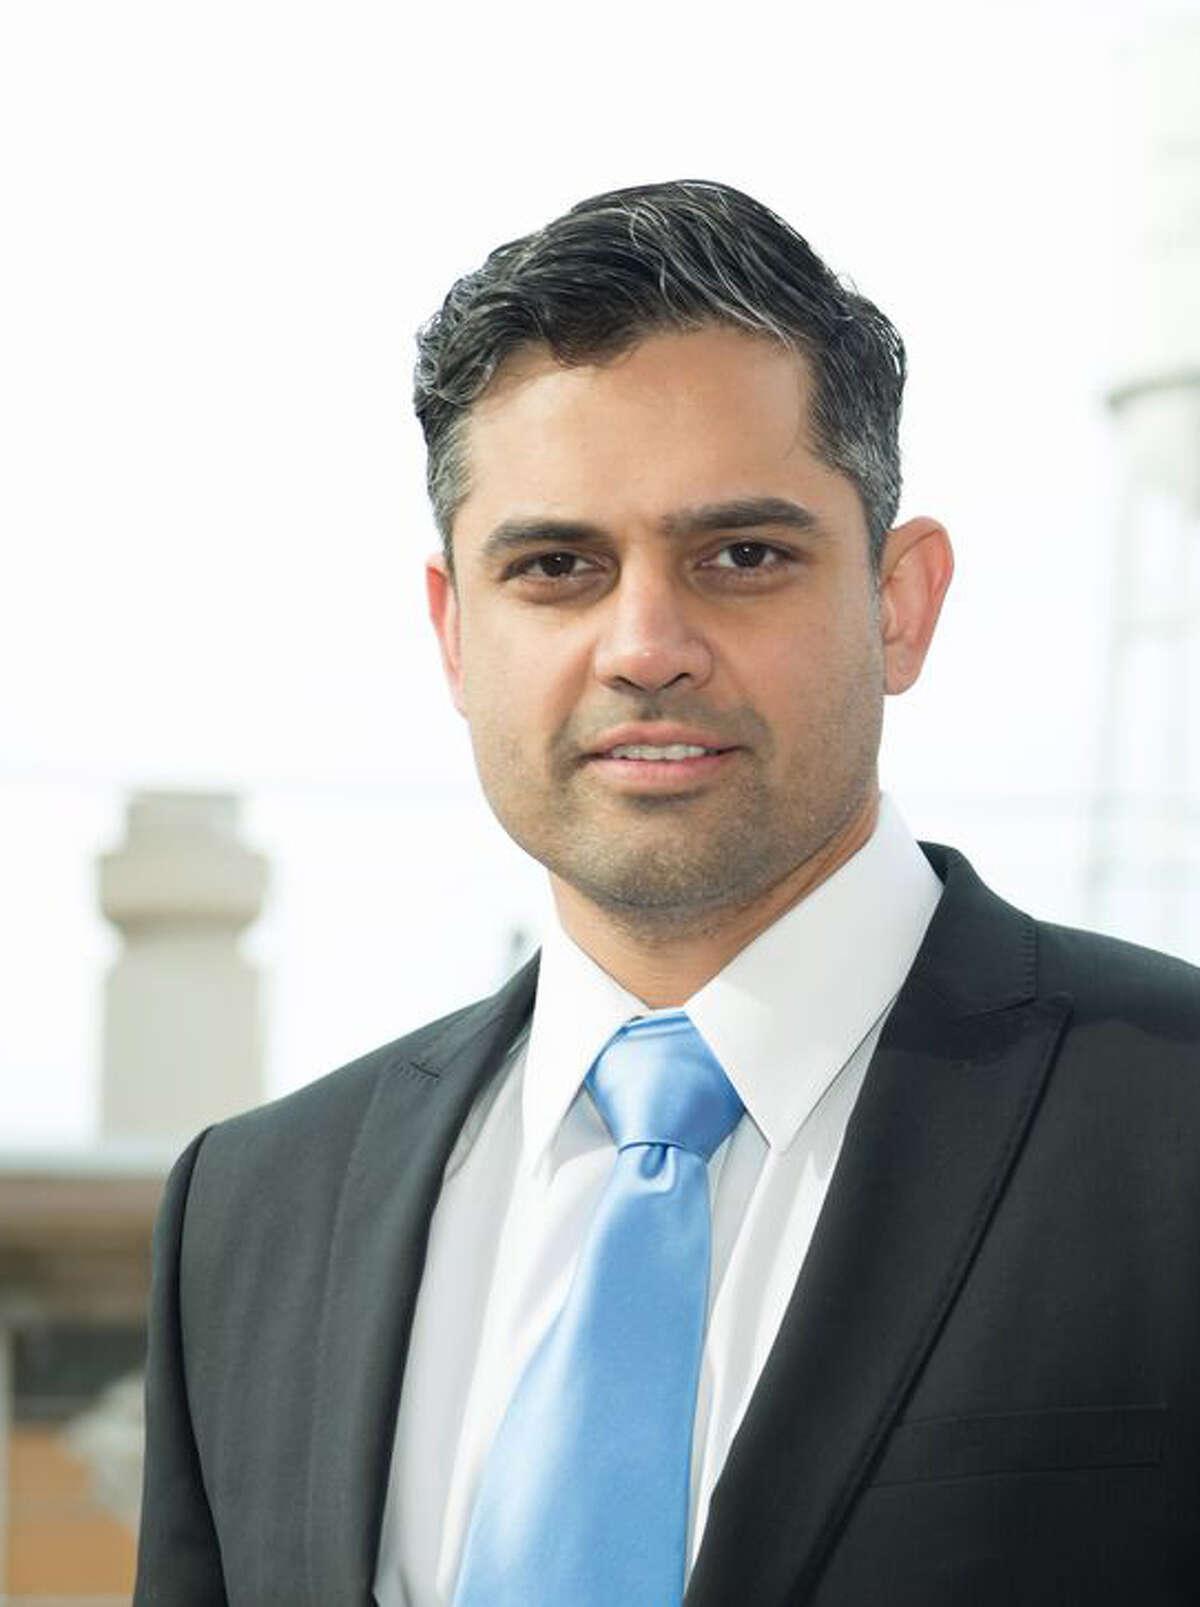 Sri Preston Kulkarni, candidate for U. S. Representative District 22.